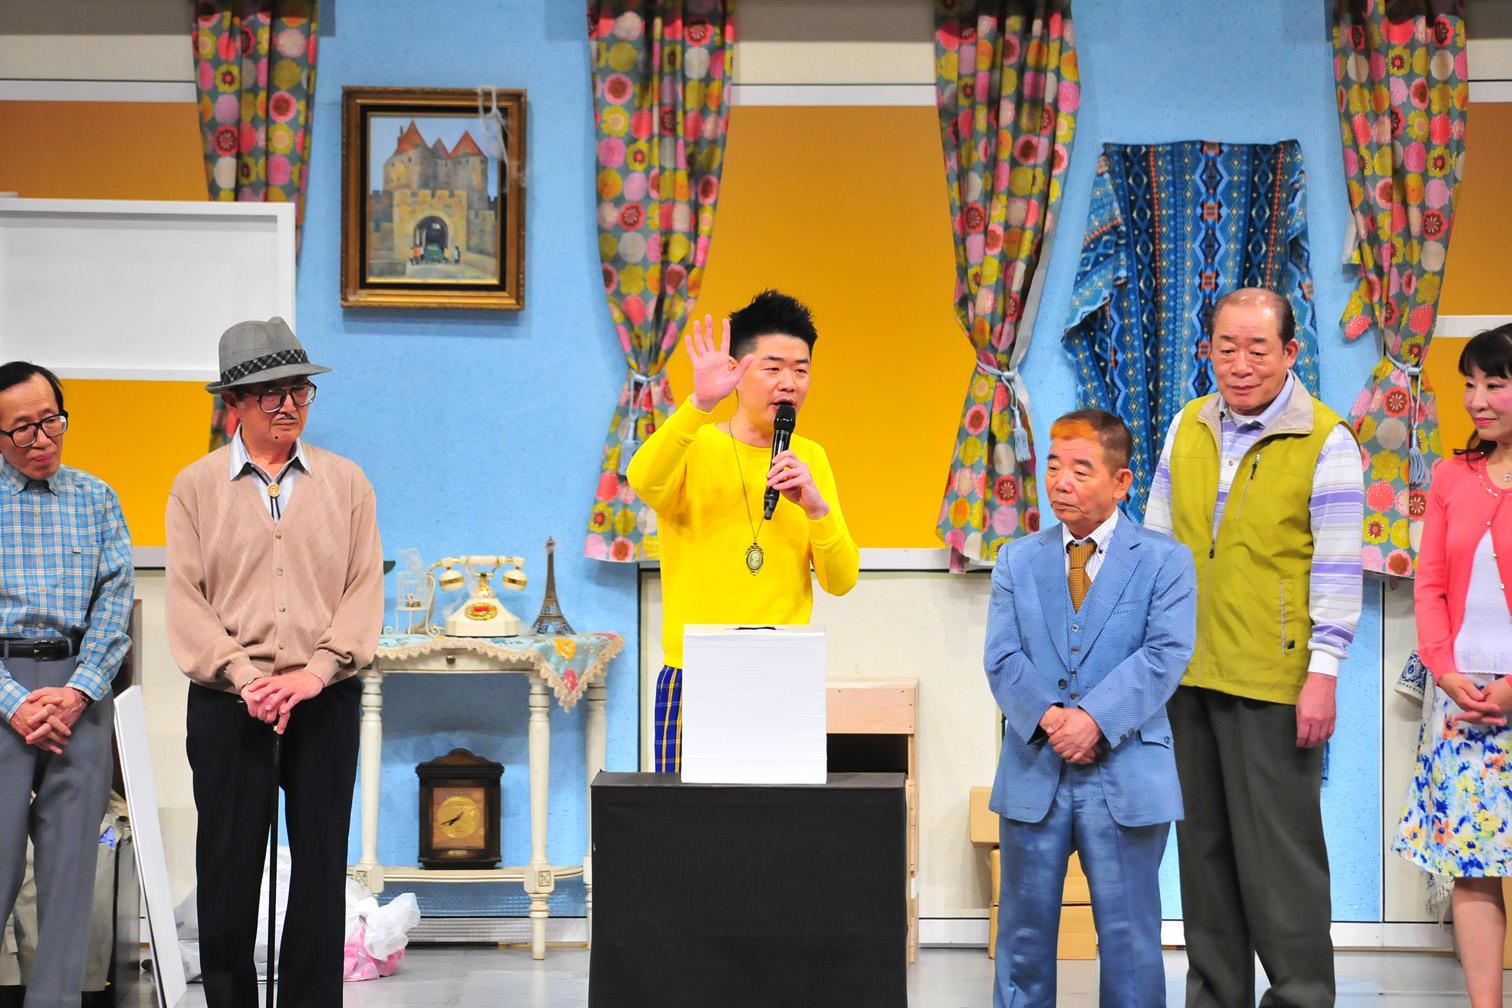 http://news.yoshimoto.co.jp/20160429145333-3e9f7518a719eedd42fc7609add8f2233fa7c1ca.jpg